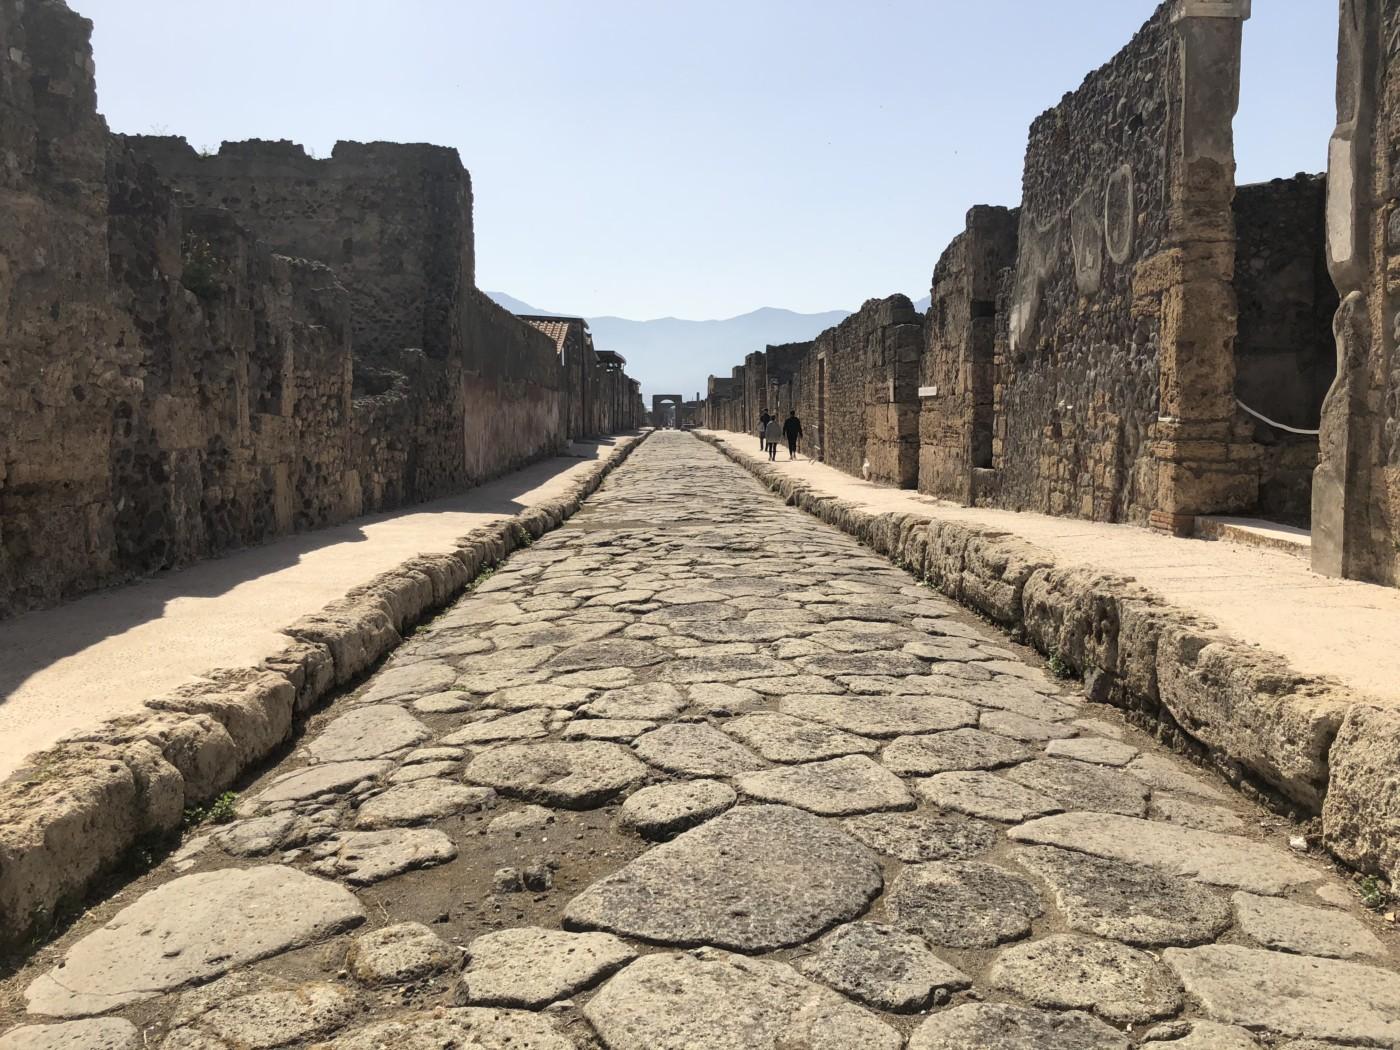 Visiting Pompeii, Italy and hiking Mount Vesuvius